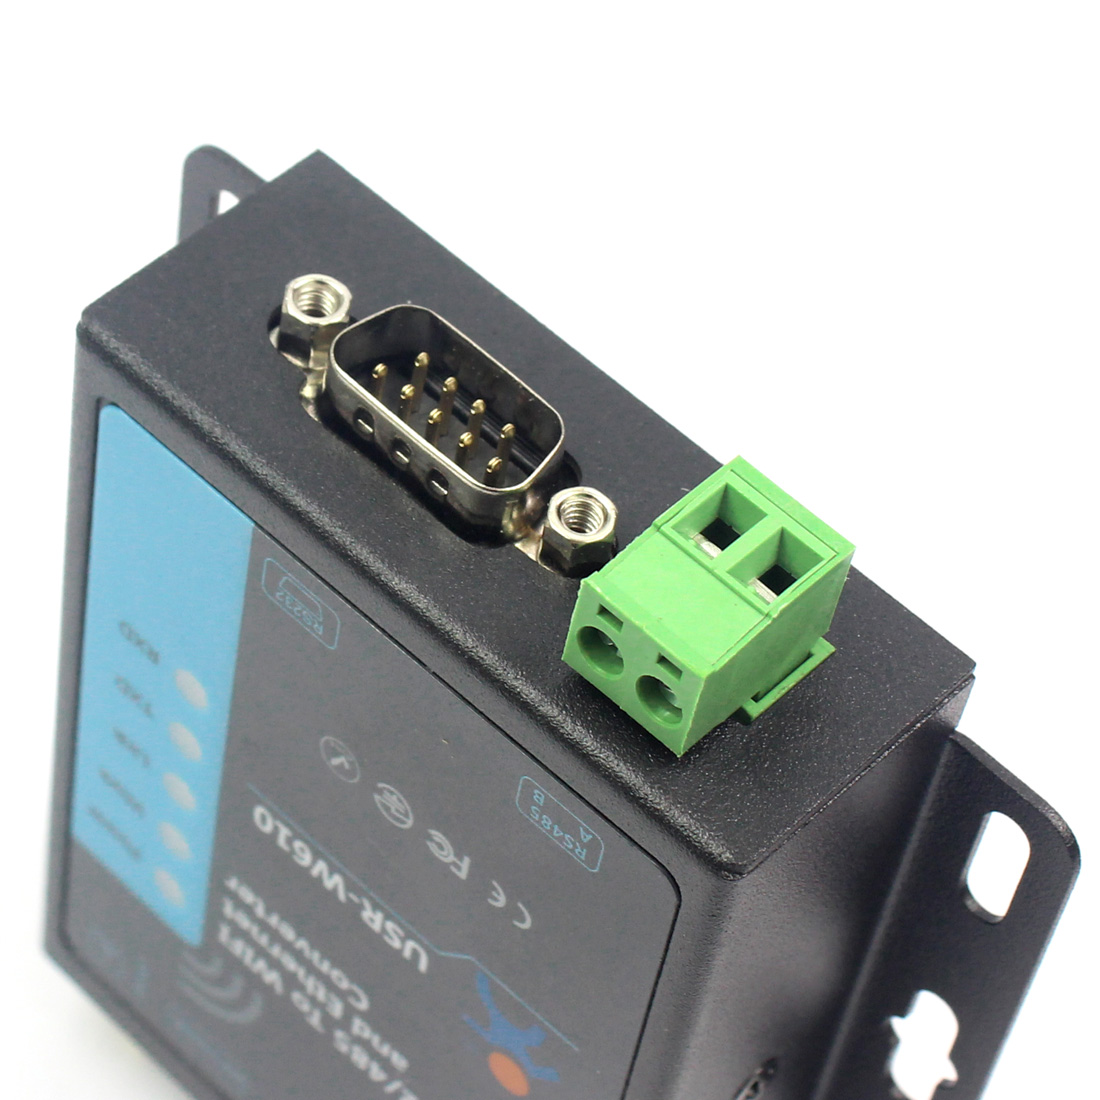 RS232 RS485 Serial to WiFi and Ethernet Converter USR-W610 Bi-directional Transmission Support Modbus VS USR-WIFI232-610 V2